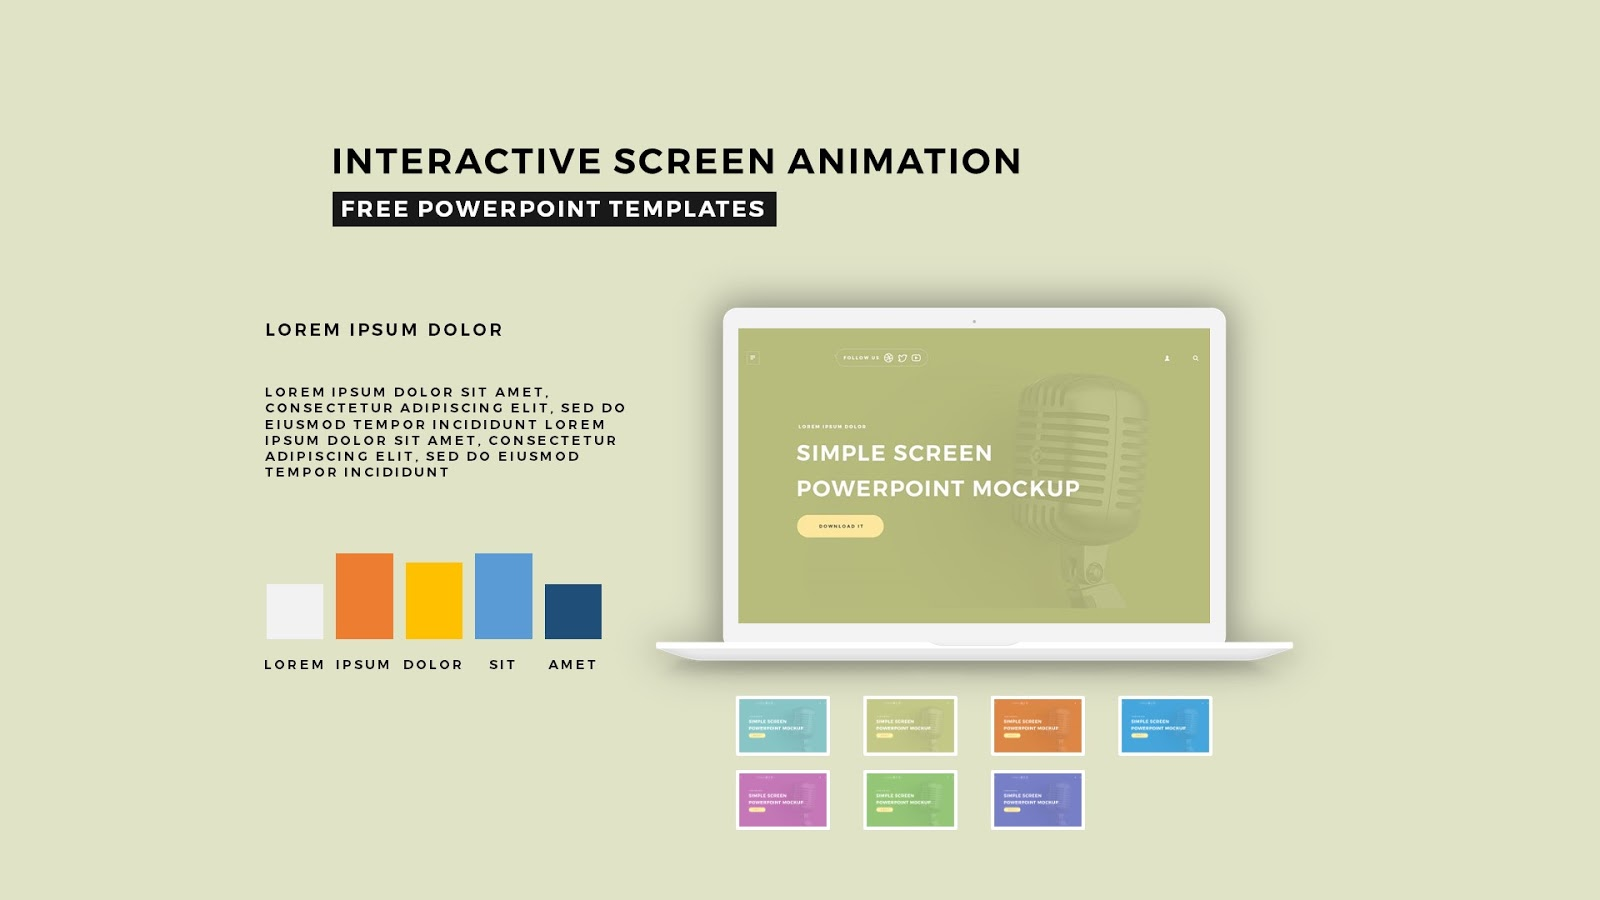 free interactive powerpoint presentation templates - interactive screen animation powerpoint template